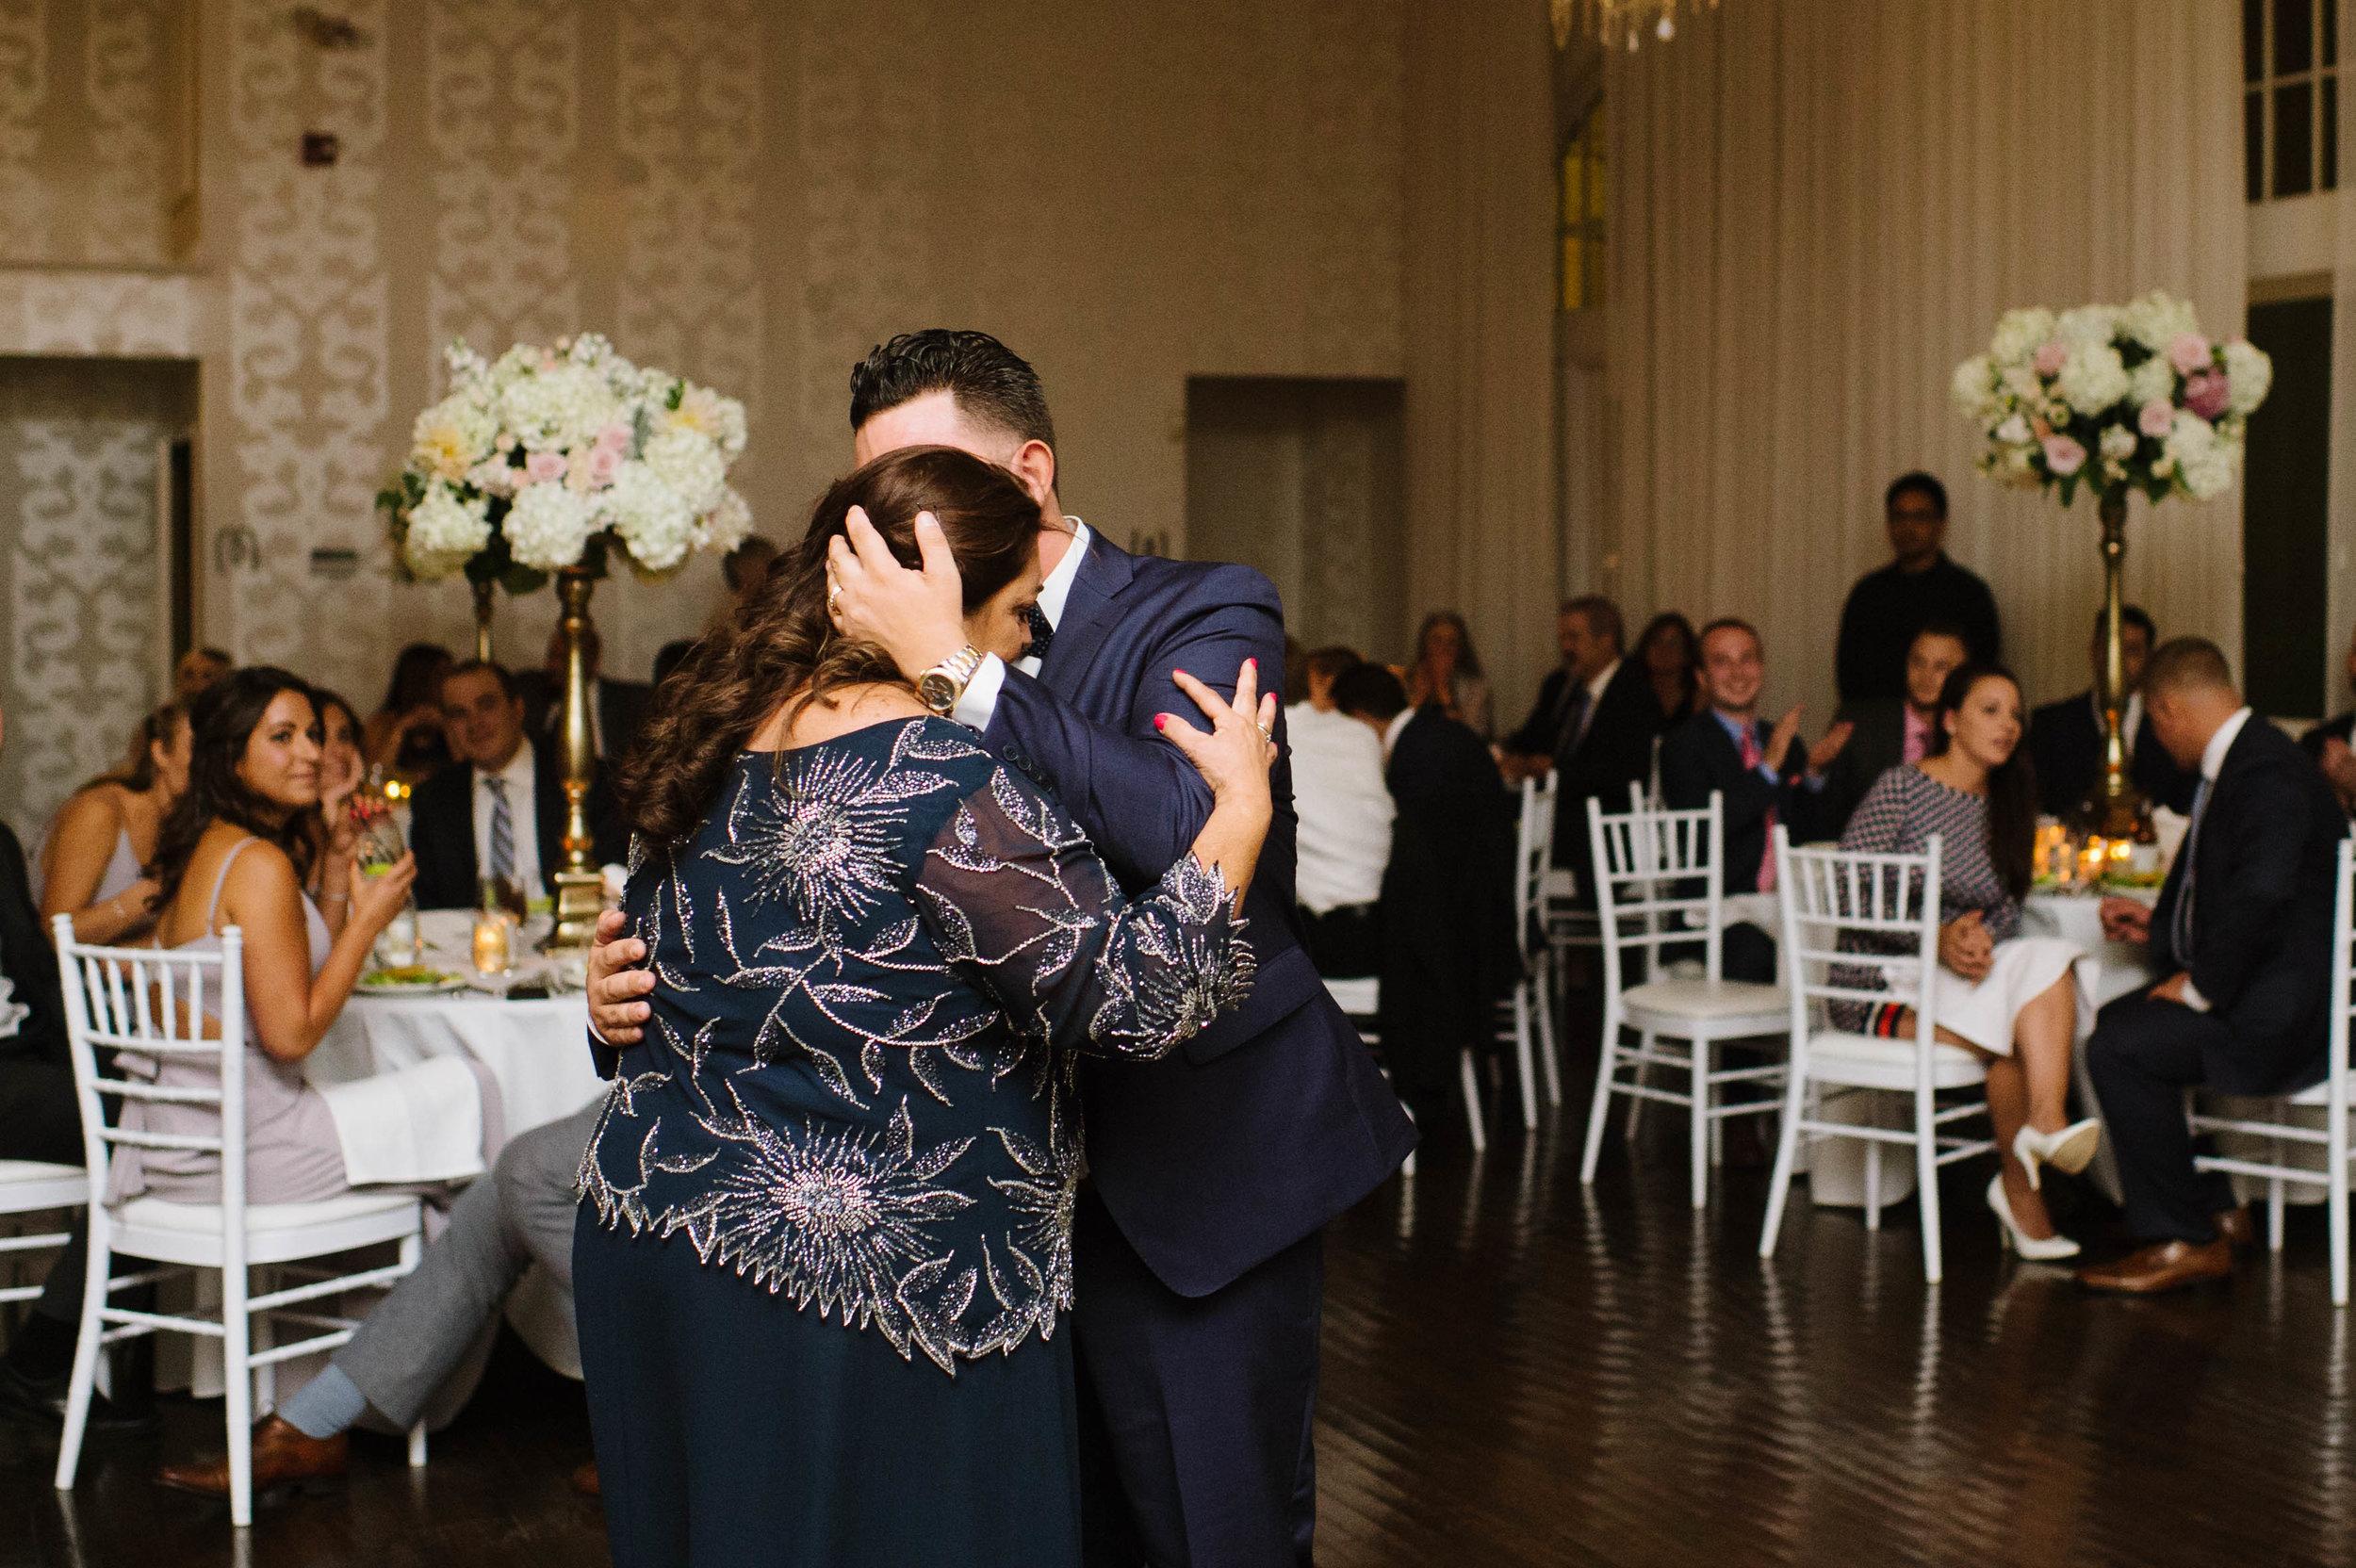 Documentary-Wedding-Photography-Newport009.jpg